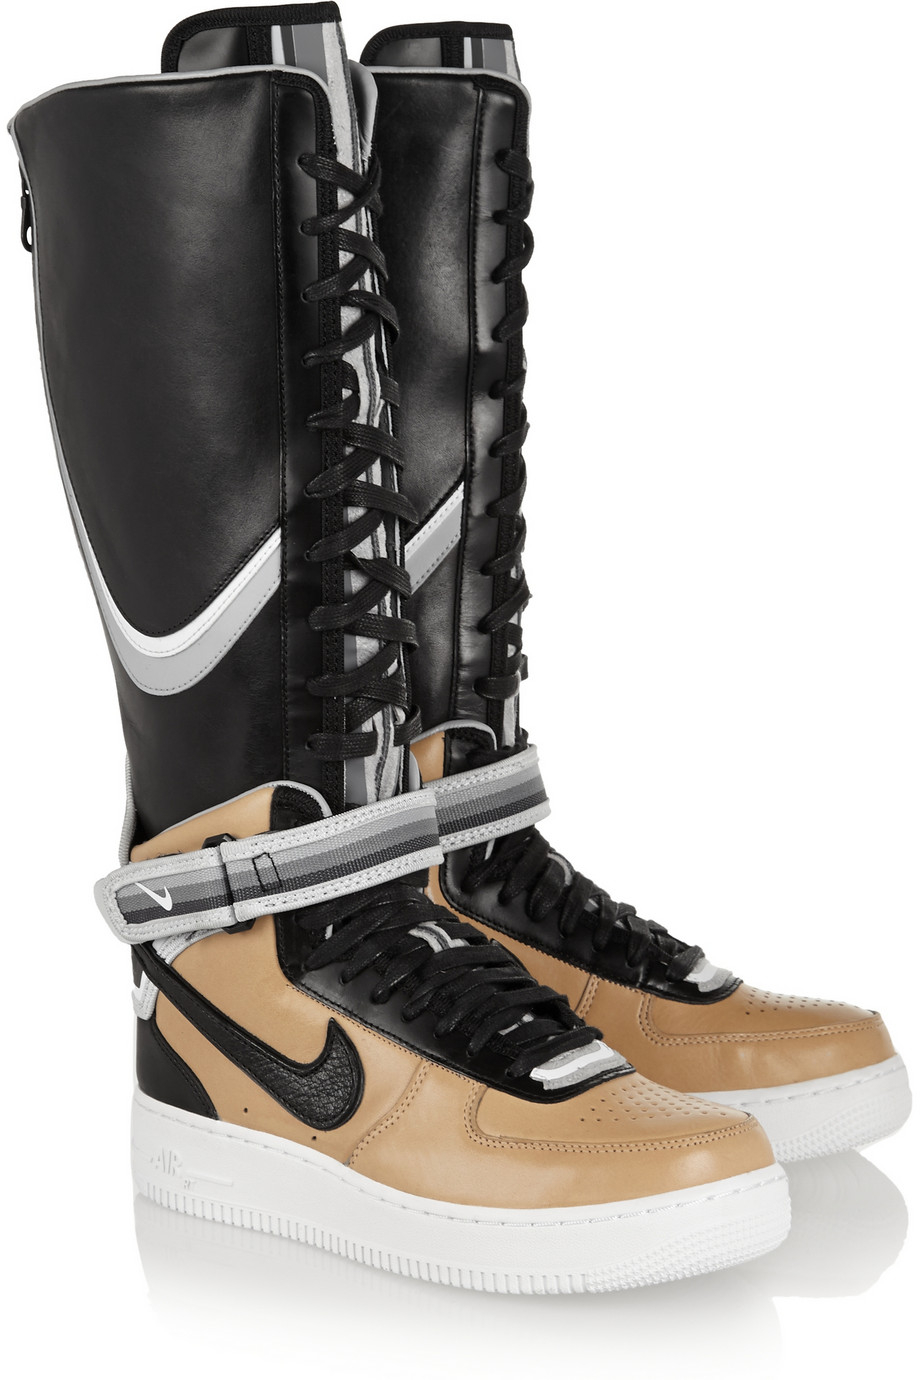 Lyst Nike Riccardo Tisci Air Force 1 Leather High Top